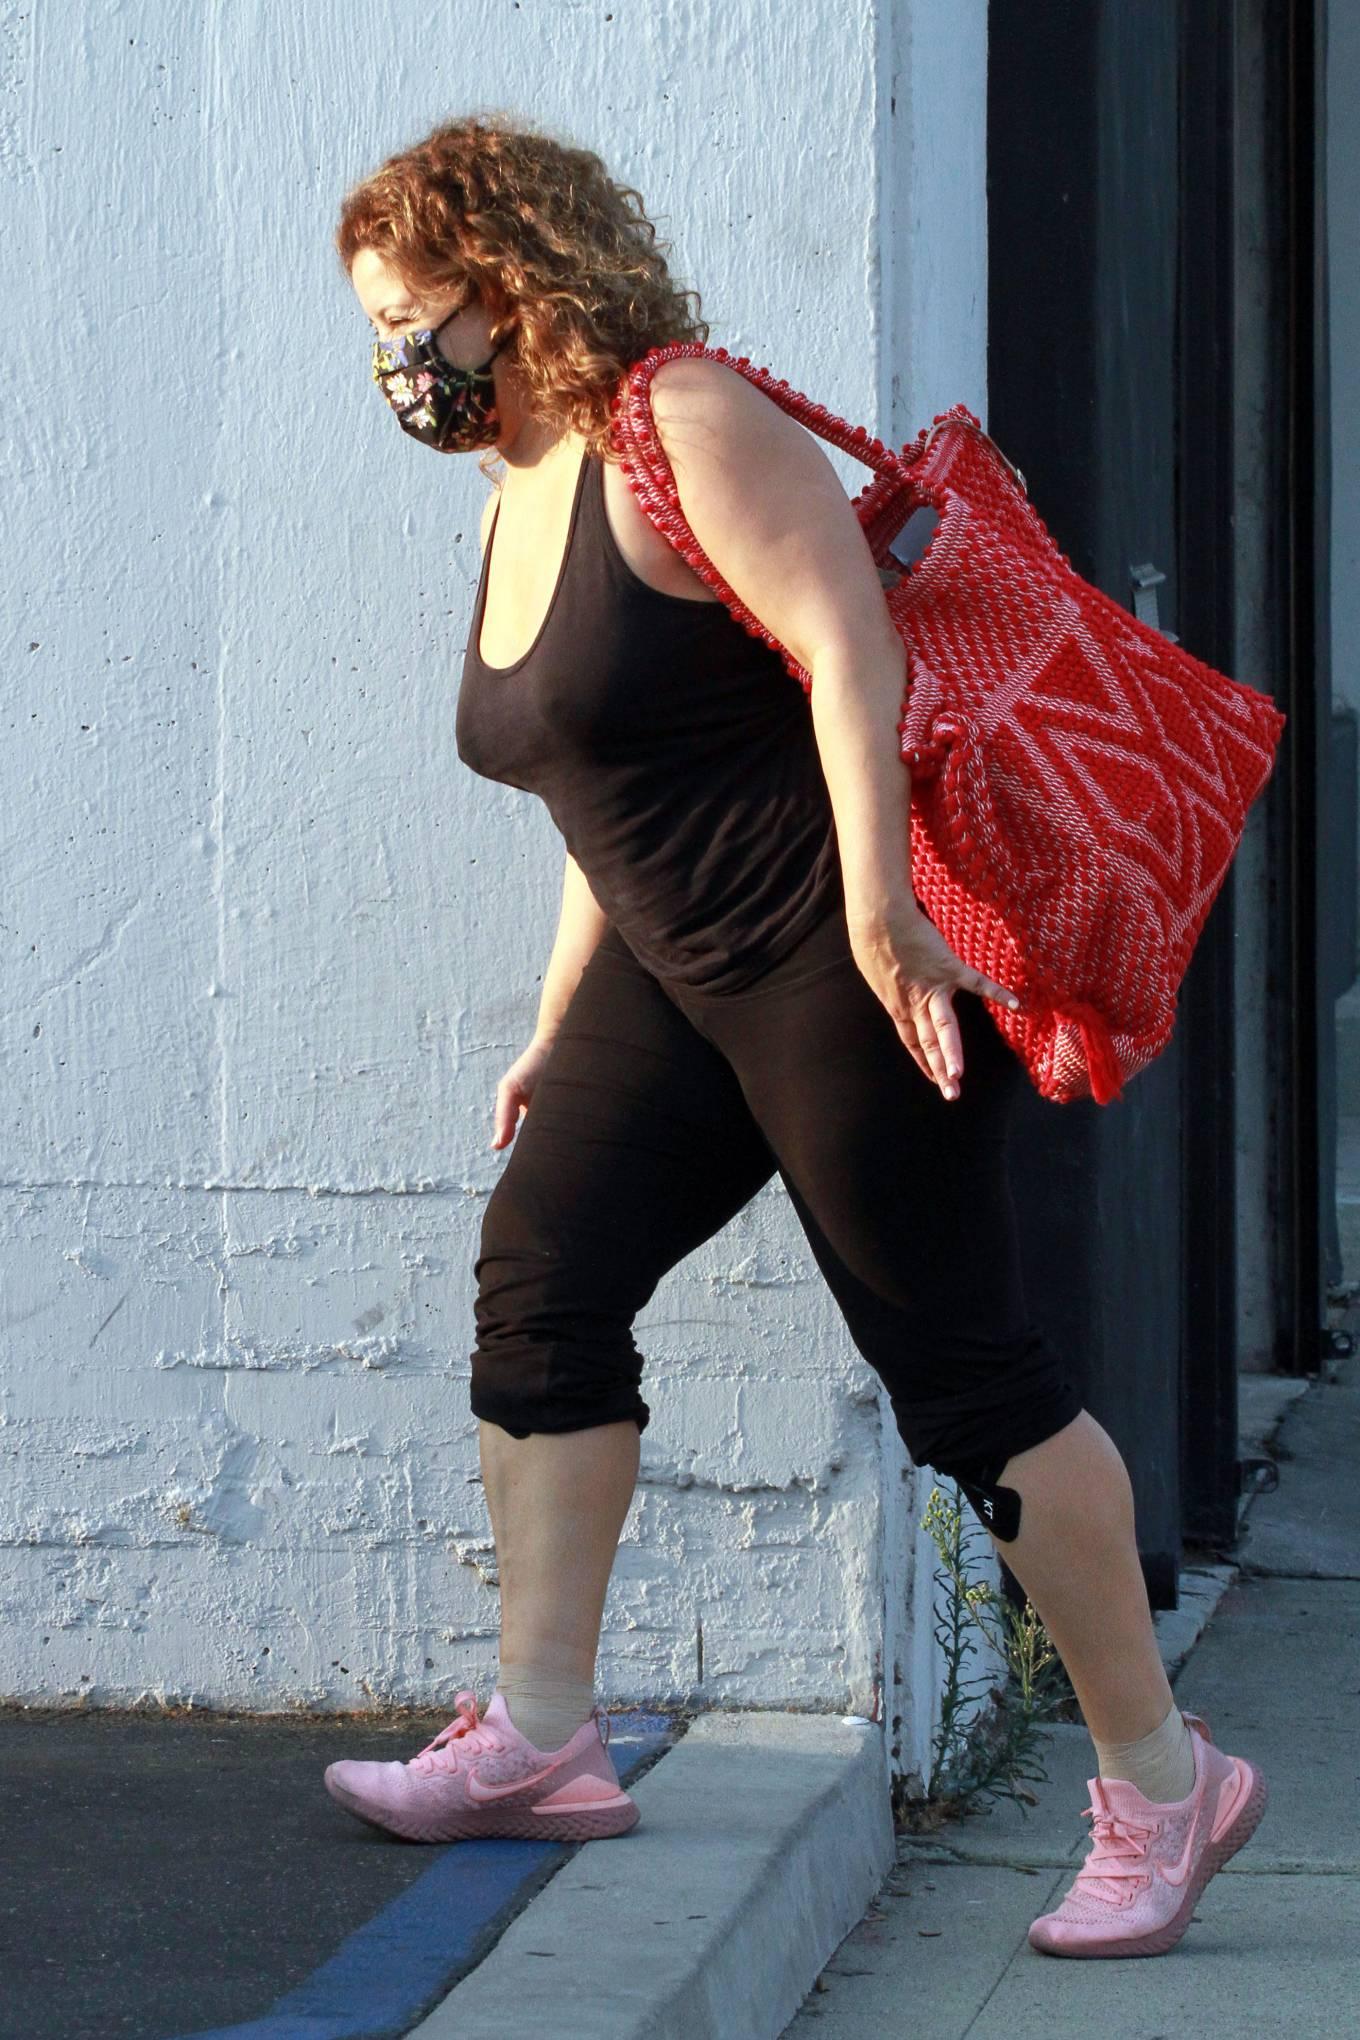 Justina Machado 2020 : Justina Machado – Seen at the dance studio in Los Angeles-07